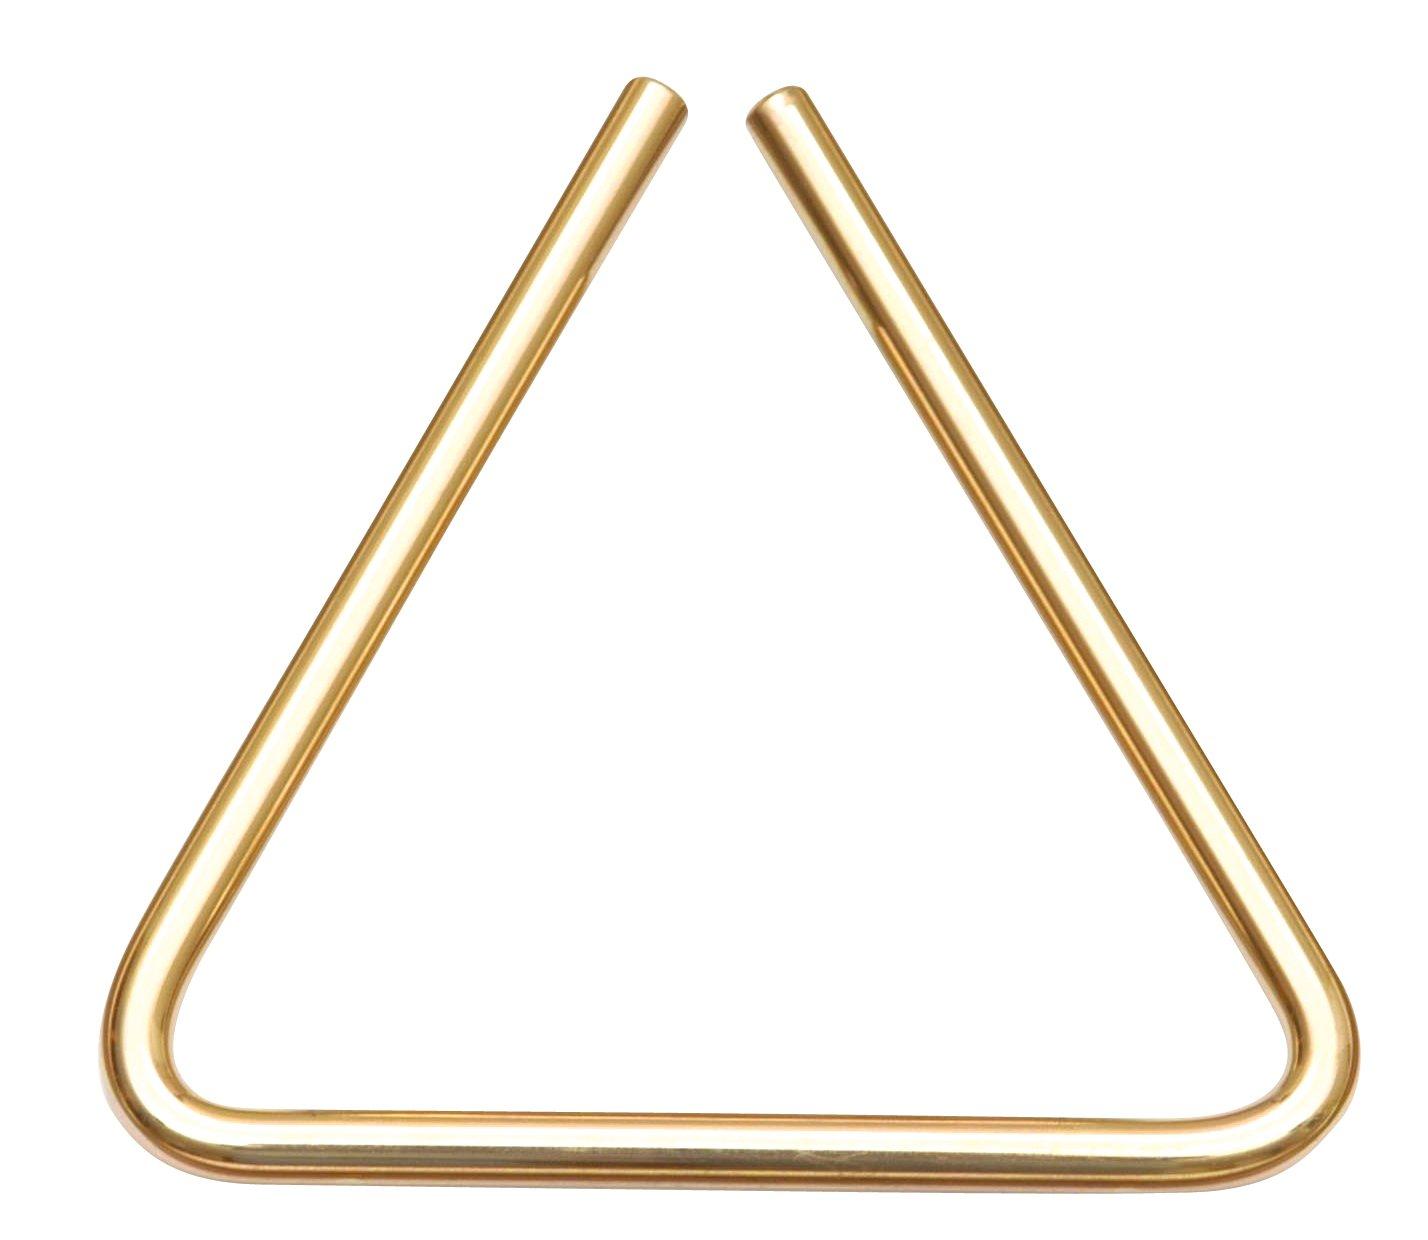 Sabian Triangles 61134-6B8 6-Inch B8 Bronze Triangle